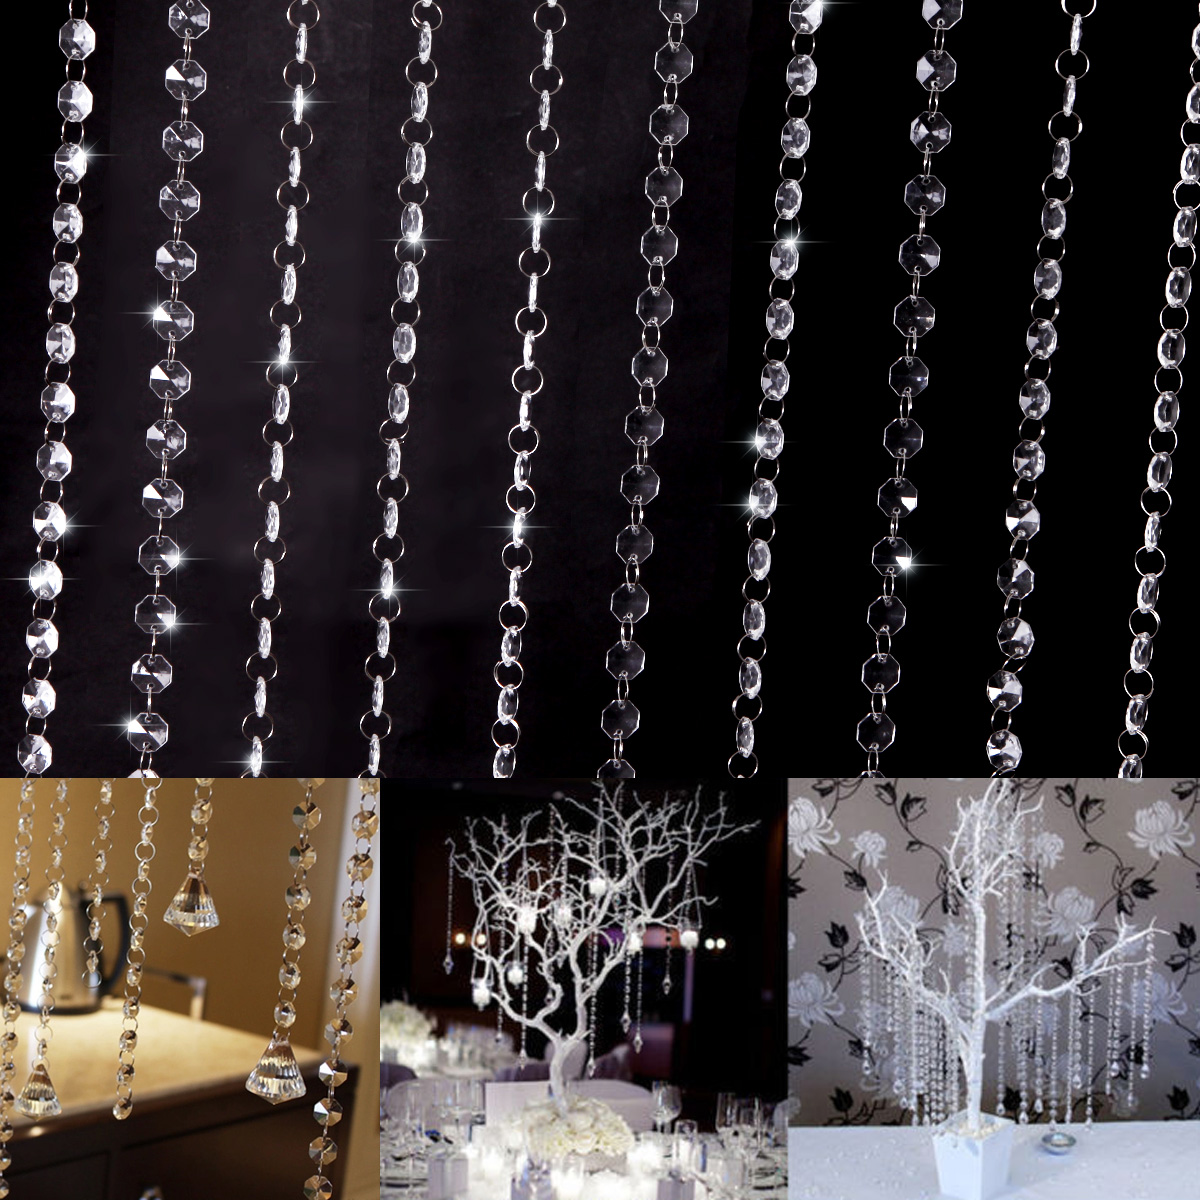 10er 1 meter kristall kette vorhang clear hochzeit party - Cortinas de abalorios ...